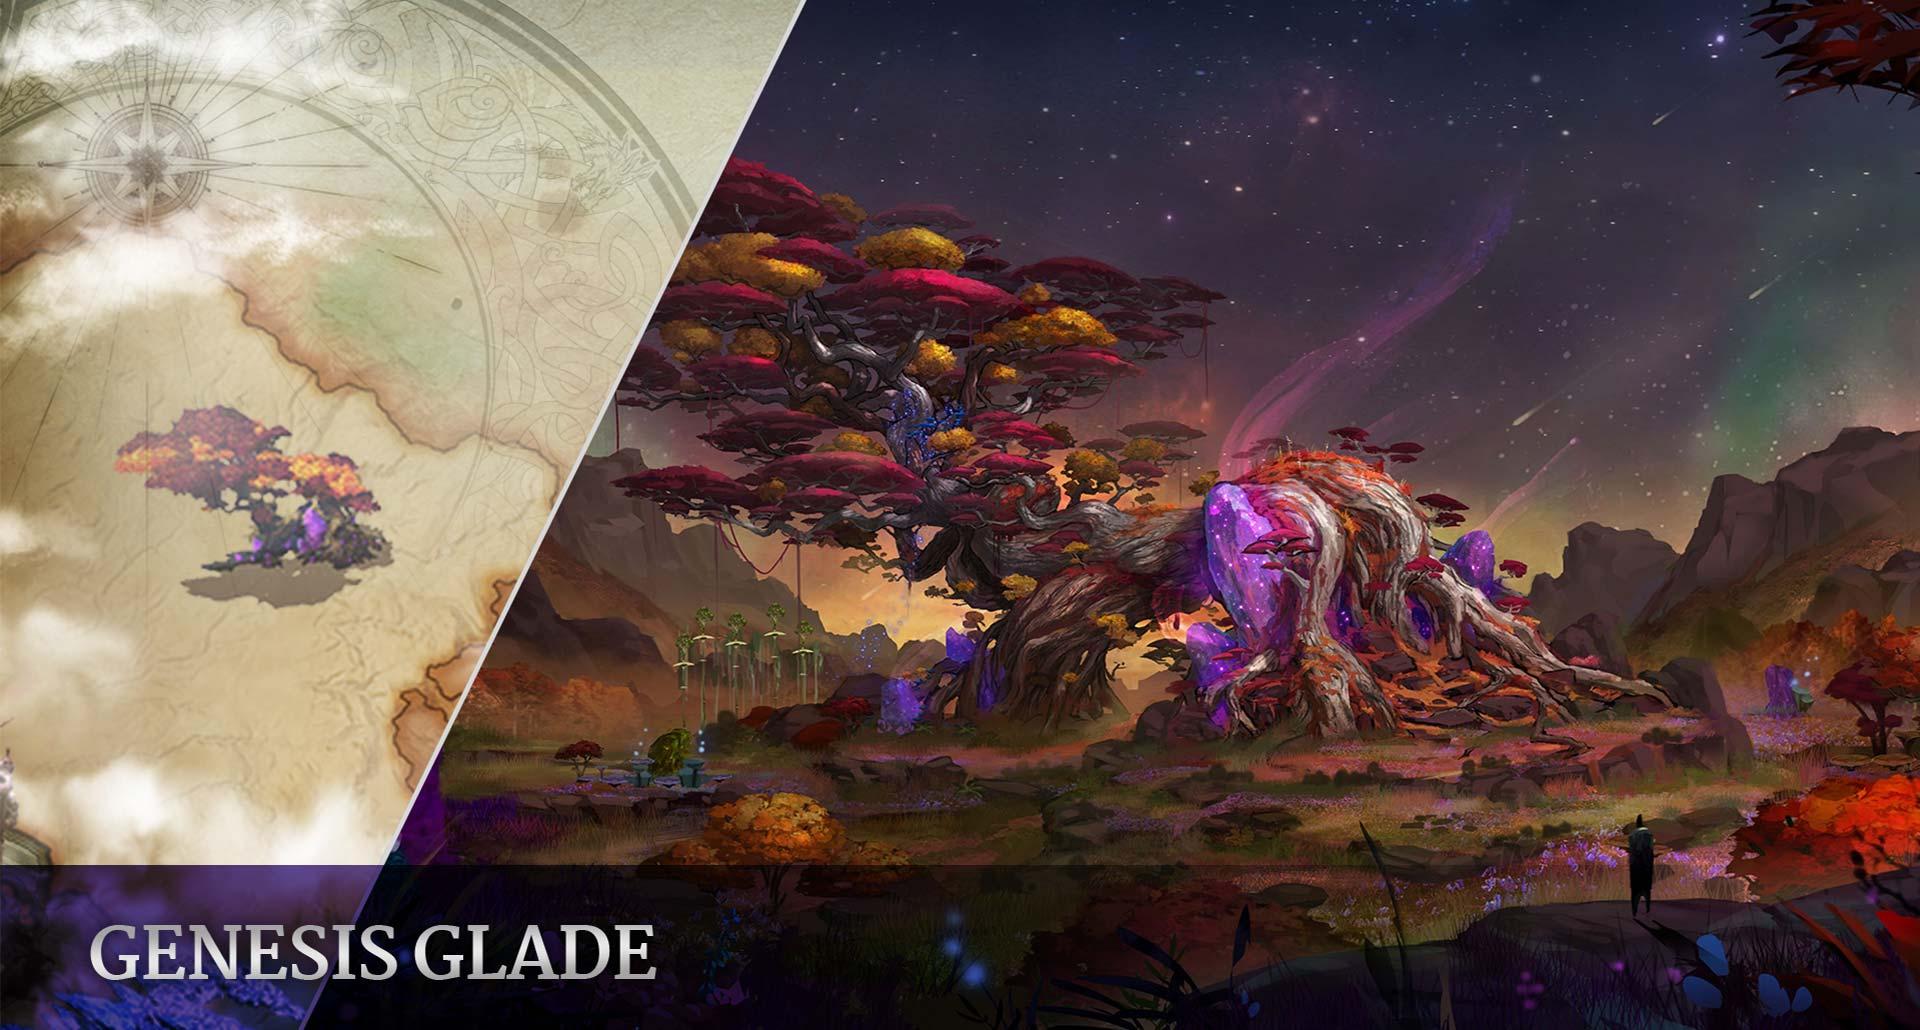 Genesis Glade